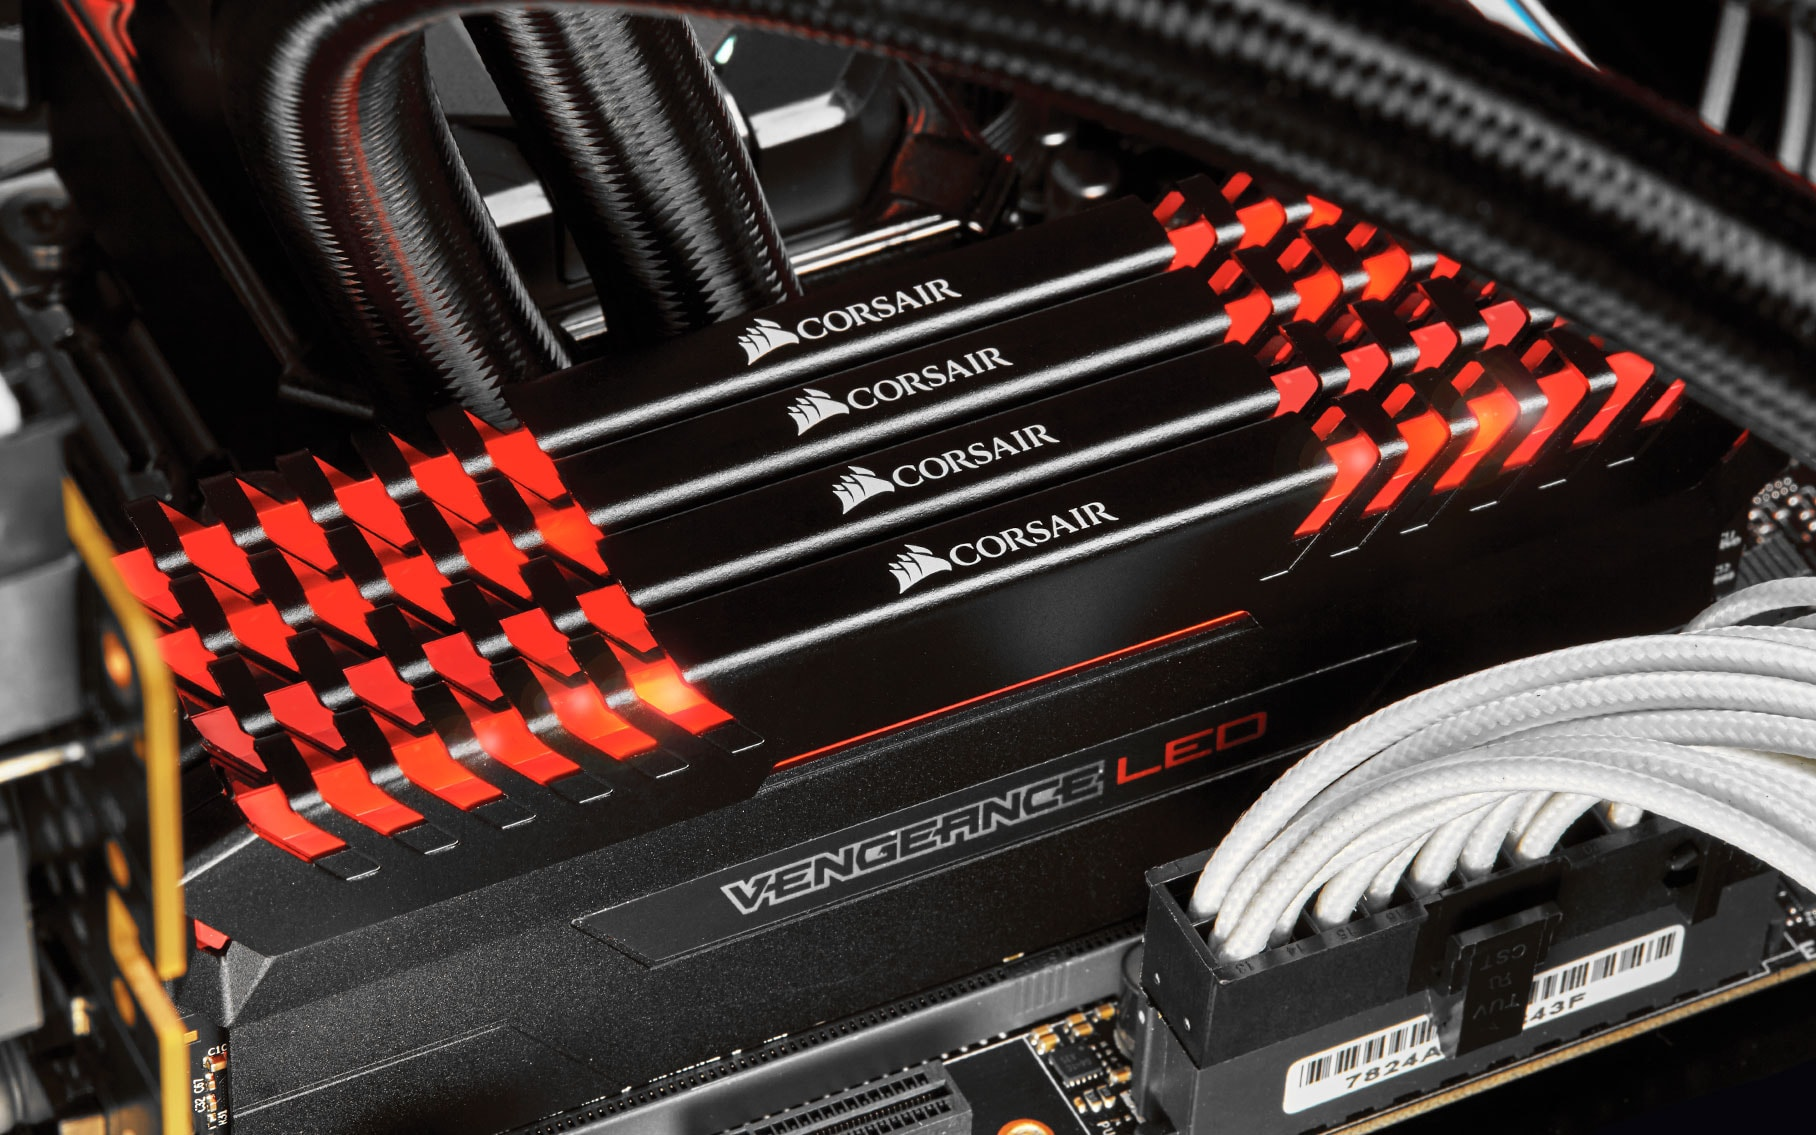 VENGEANCE LED DDR4. LIGHT IT UP.